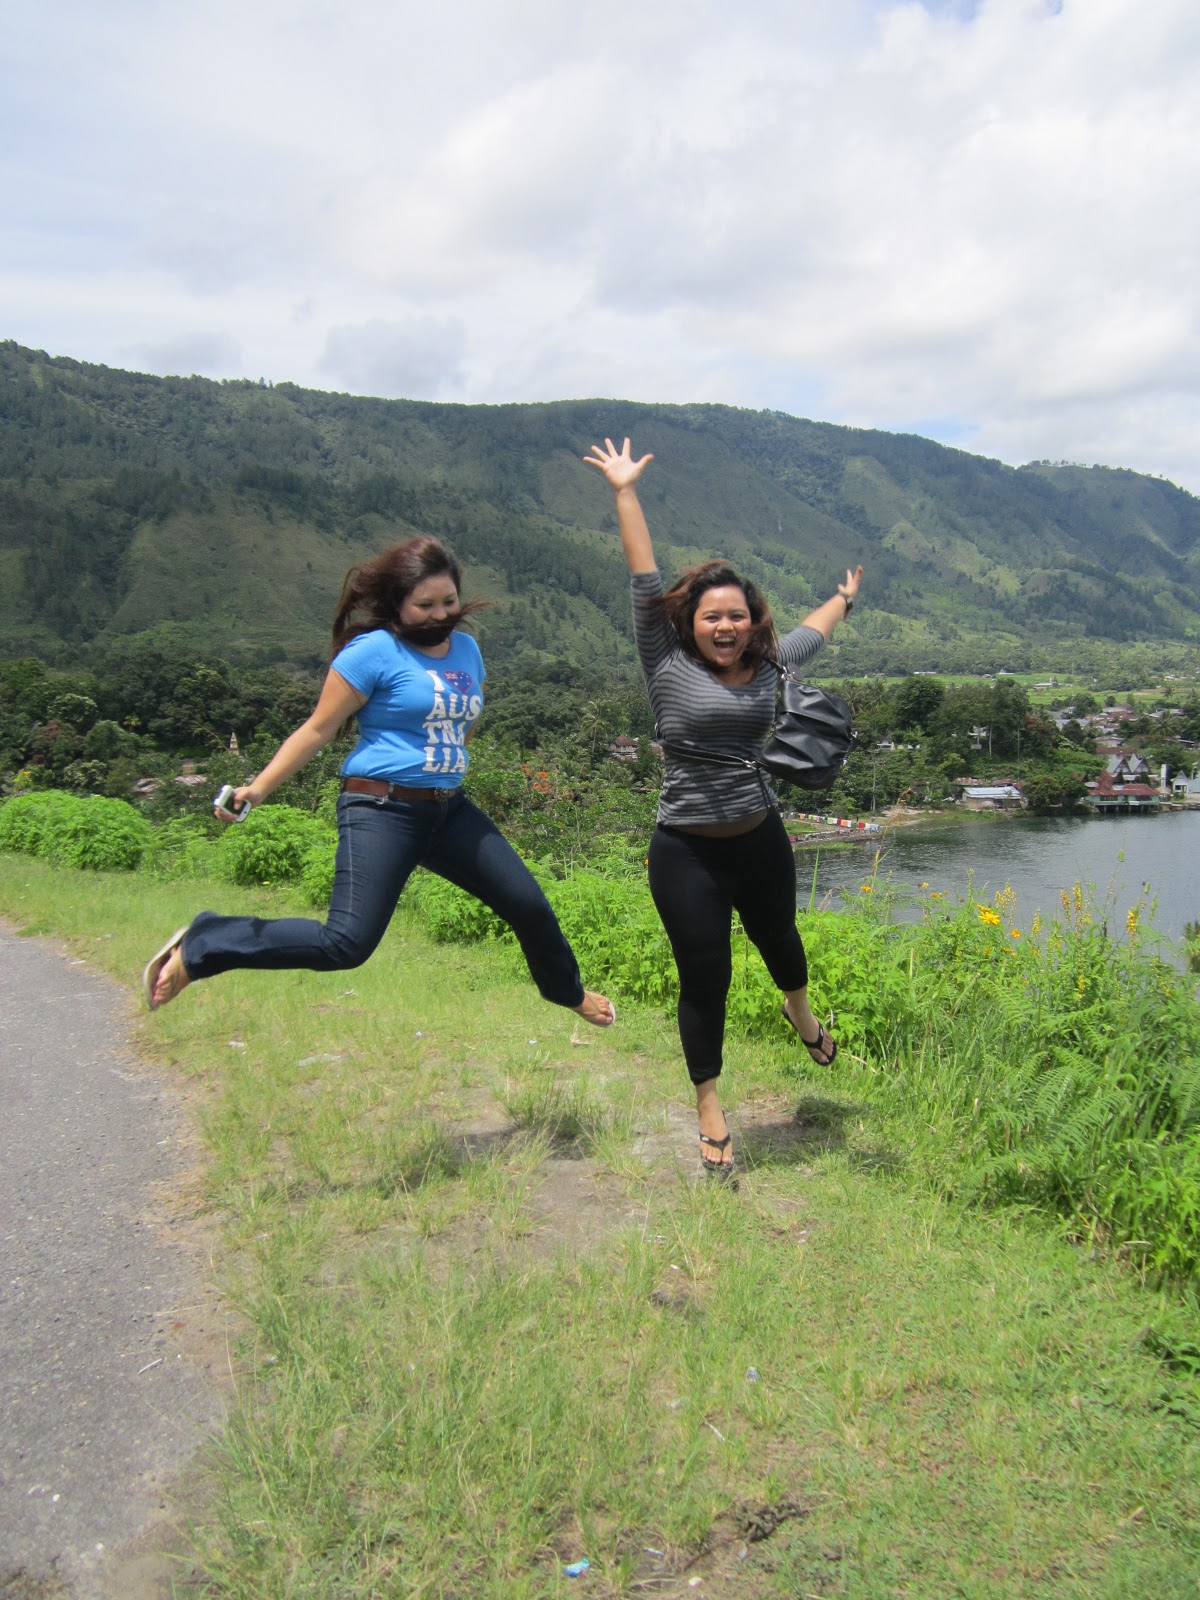 MEDAN-DANAUTOBA TRIP 2012 - day 3 (part 4)